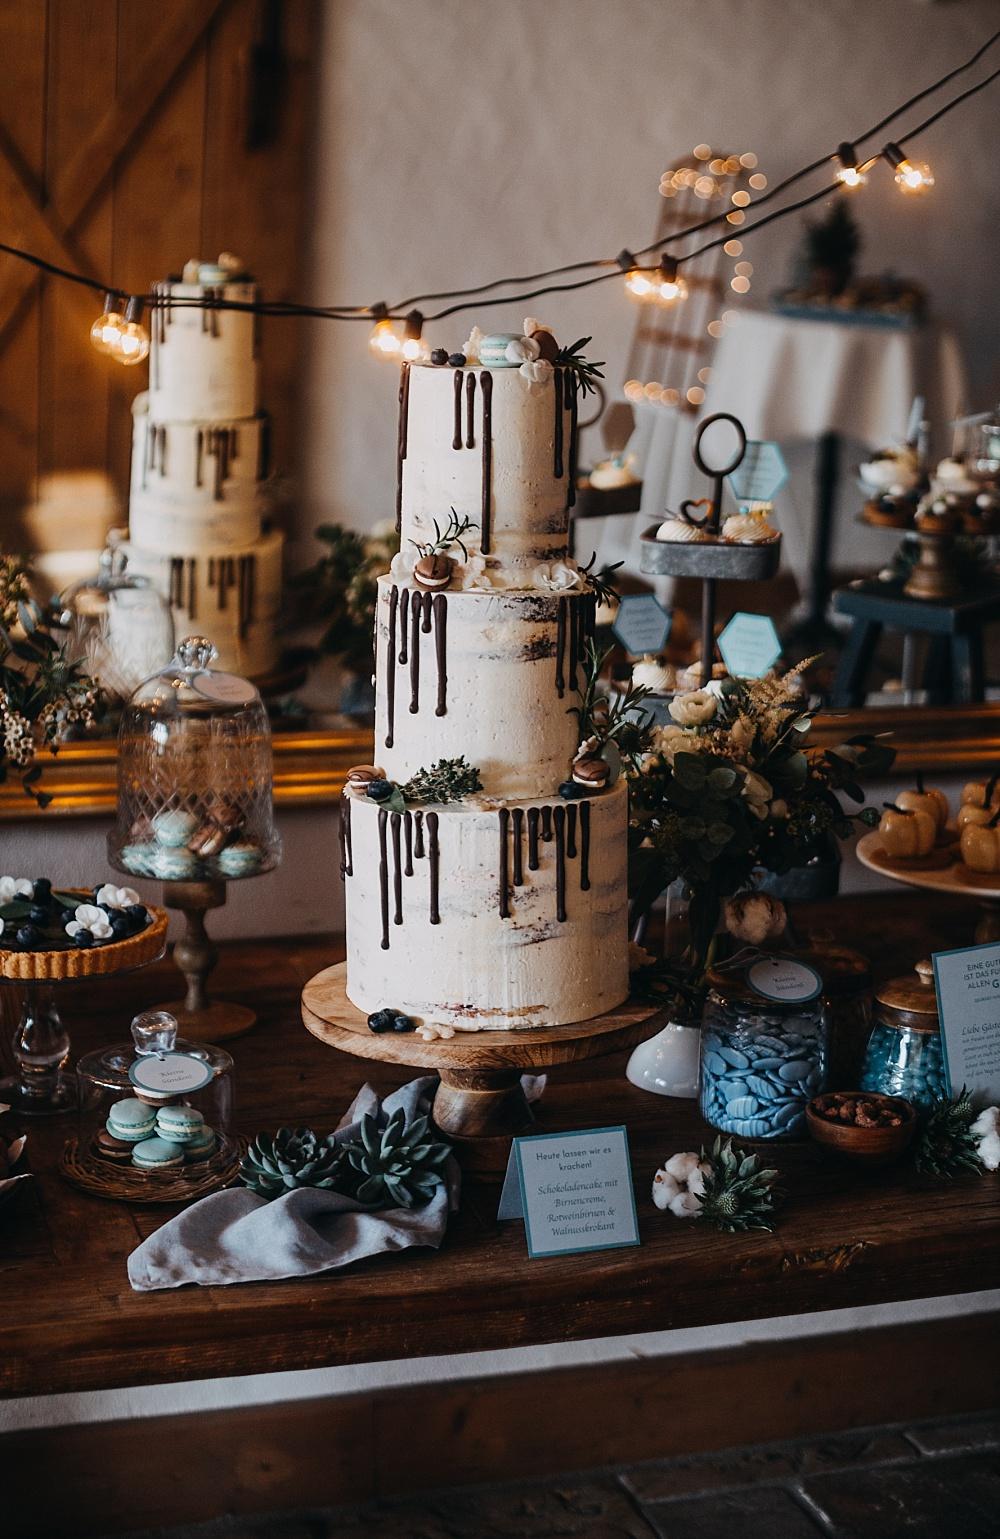 Drip Cake Hochzeit, Semi Naked Cake Hochzeitstorte, Hochzeitstorte Drip Cake,